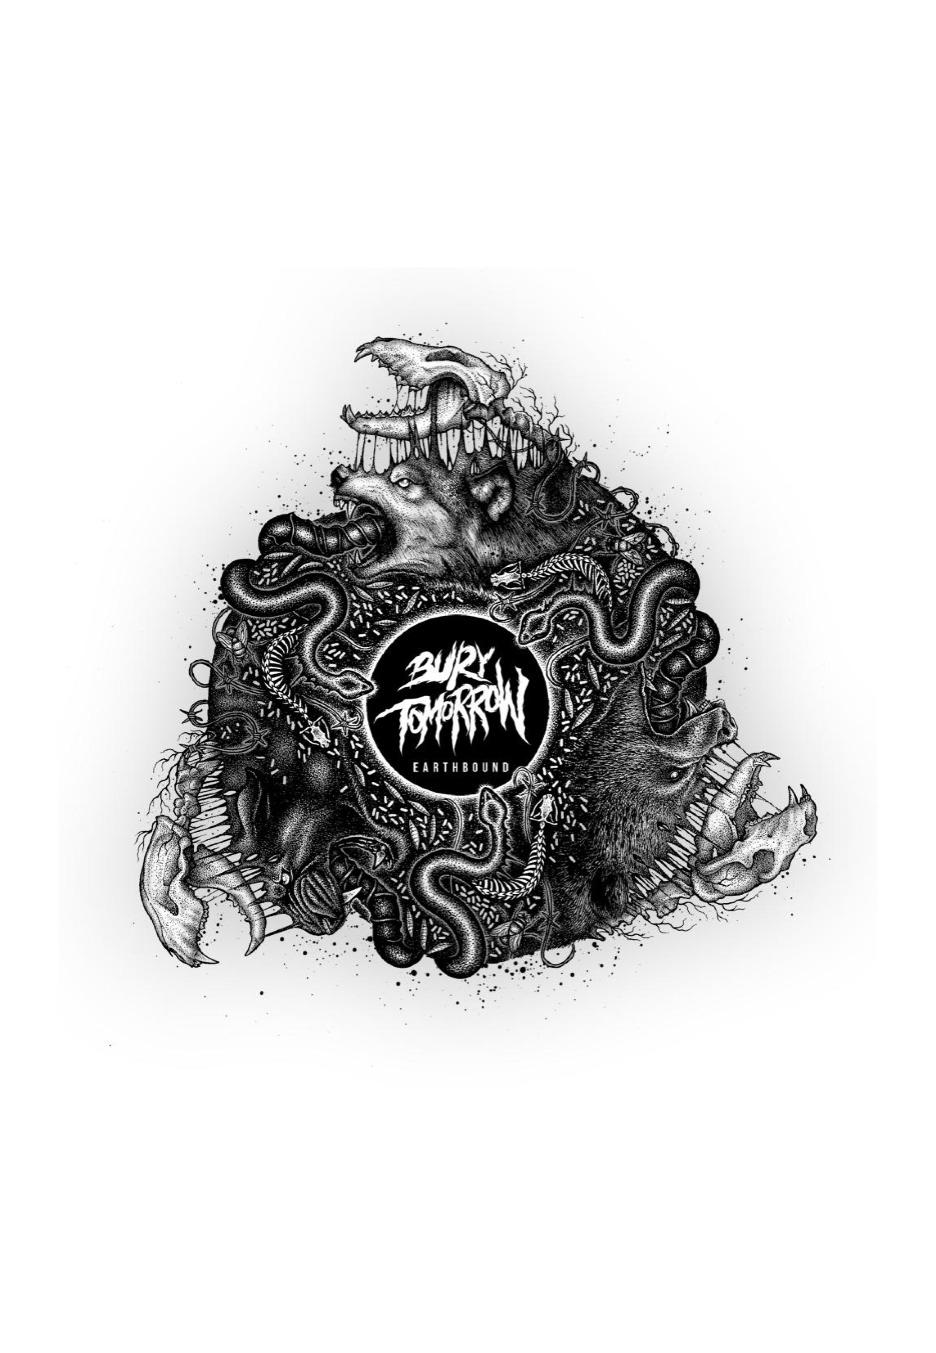 bury tomorrow earthbound cd official metalcore merchandise shop uk. Black Bedroom Furniture Sets. Home Design Ideas